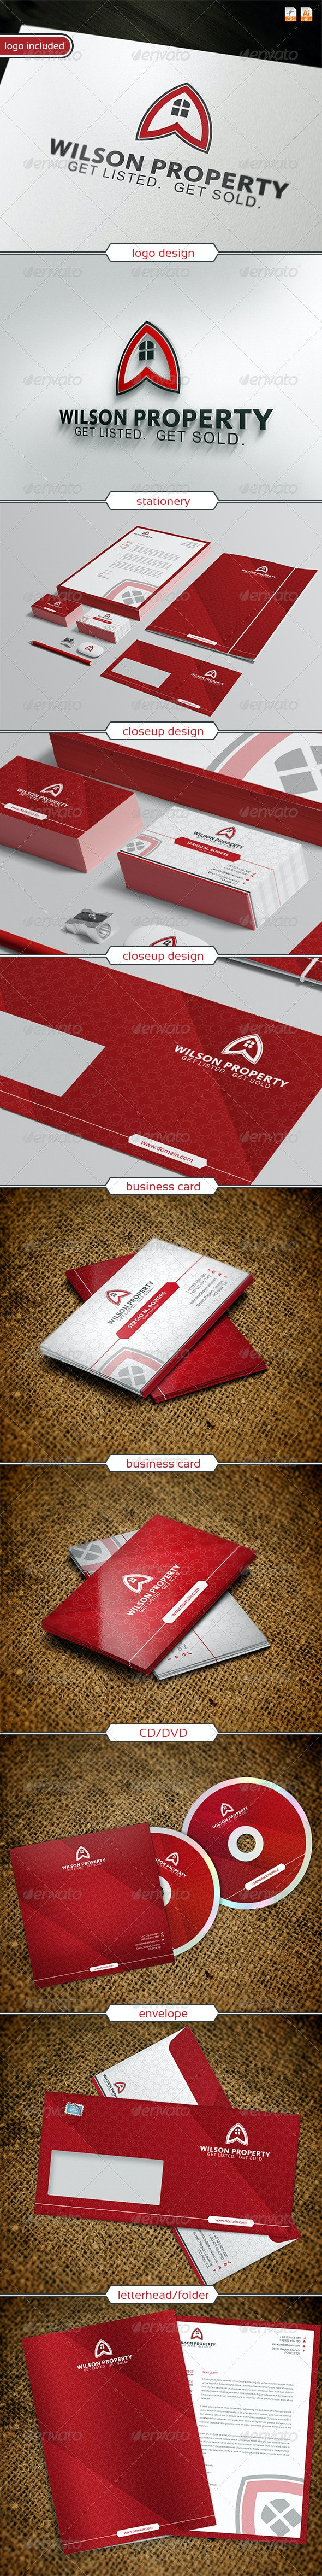 Wilson property Logo & Identity - Stationery Print Templates